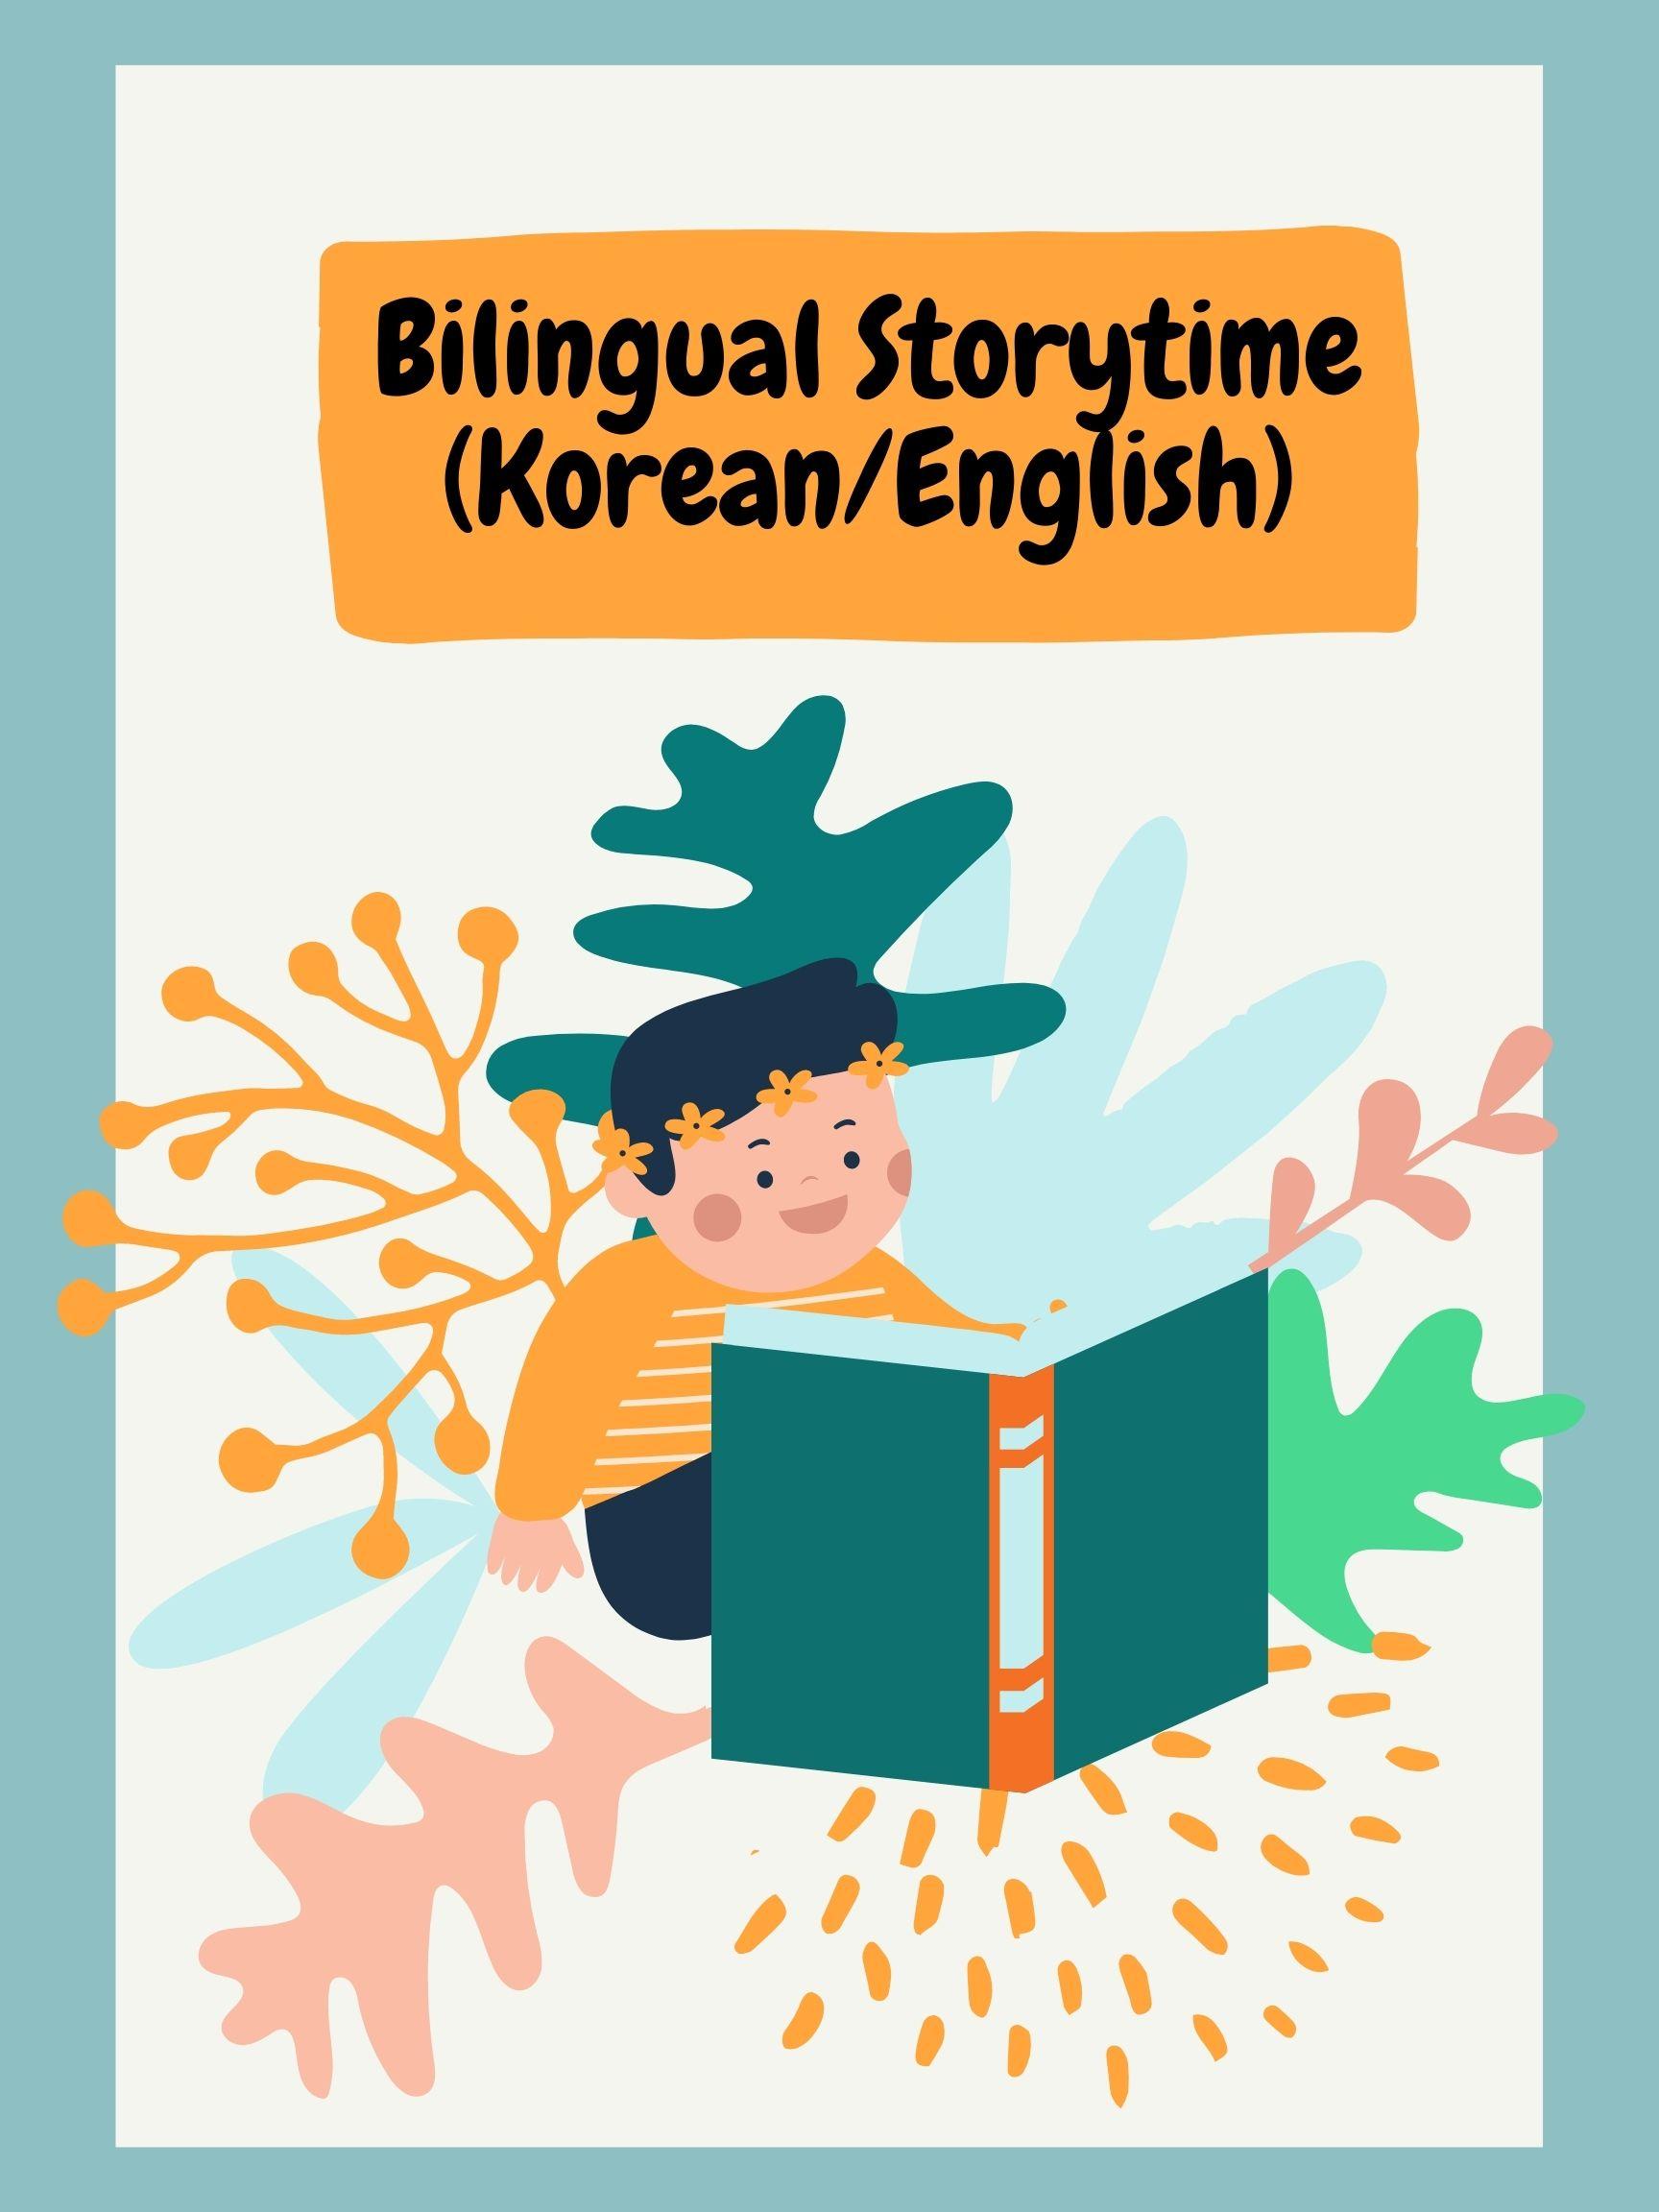 Korean/English Bilingual Storytime